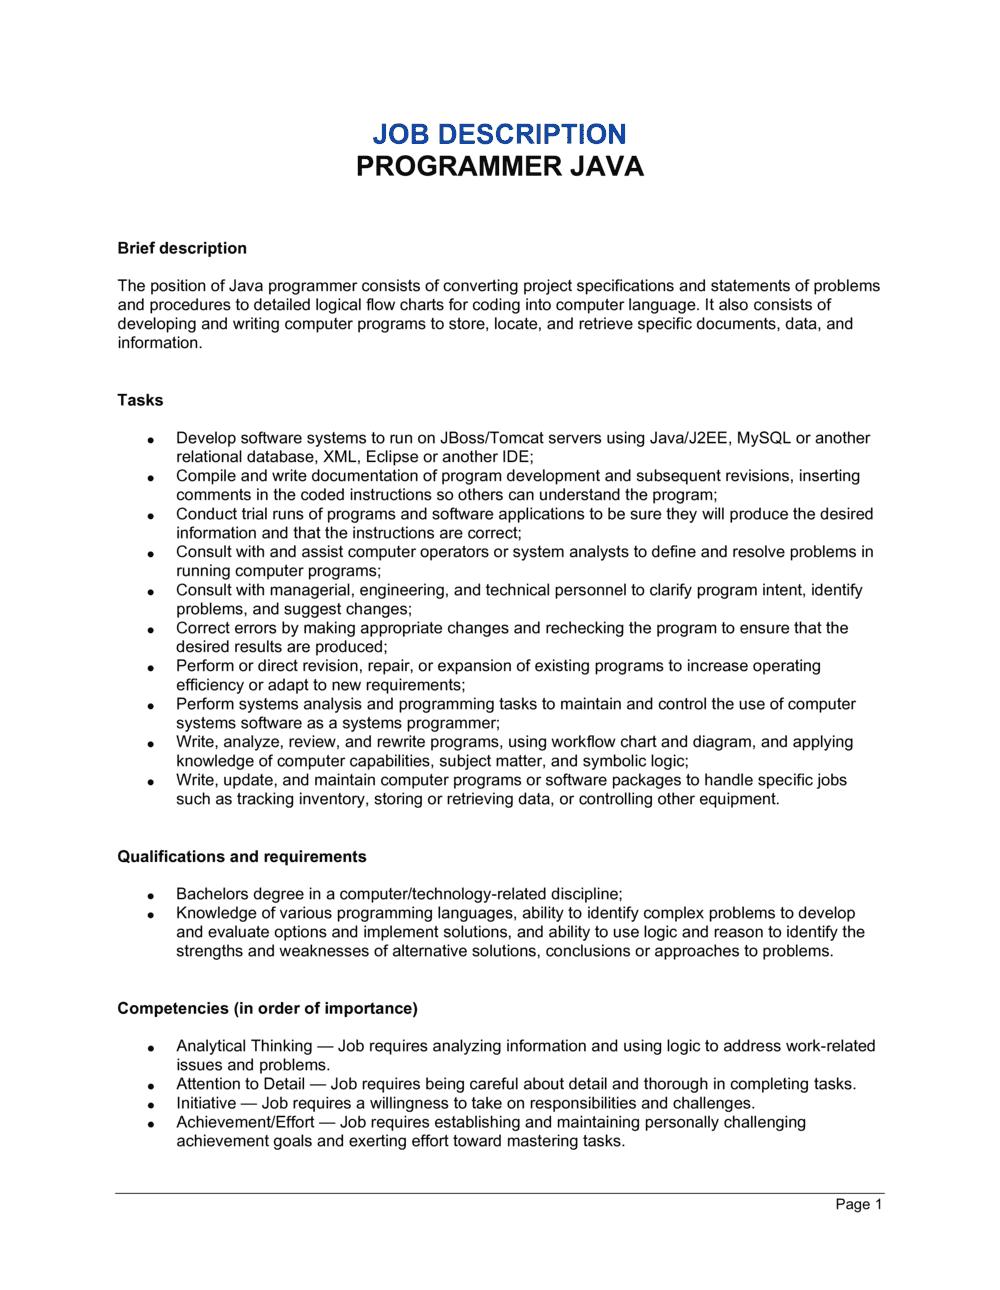 Business-in-a-Box's Programmer Java Job Description Template